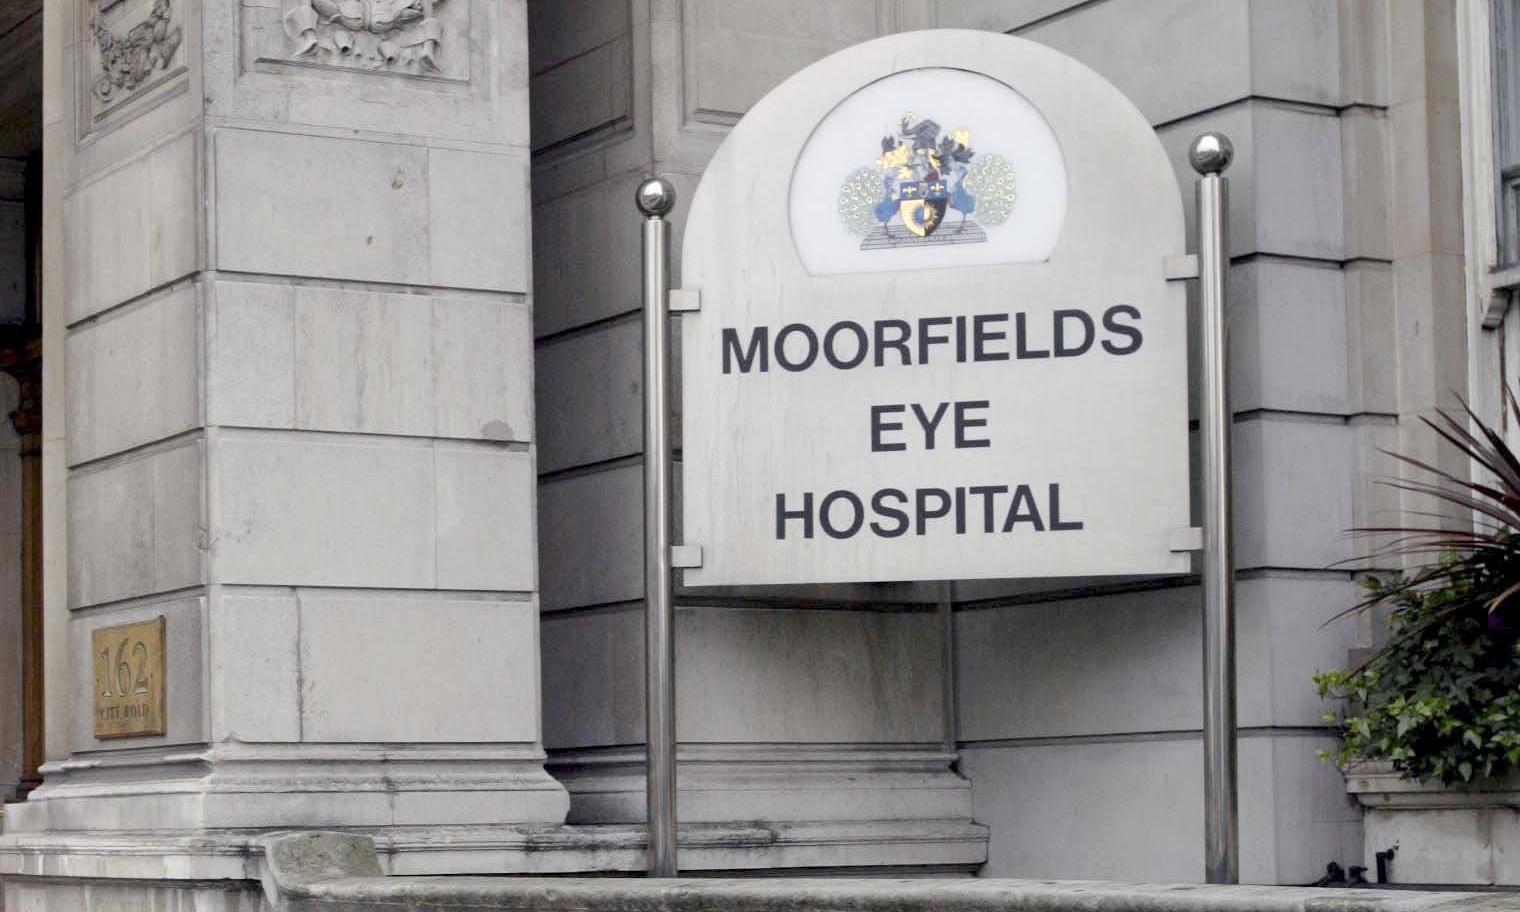 Home Office overturns NHS eye doctor's visa refusal